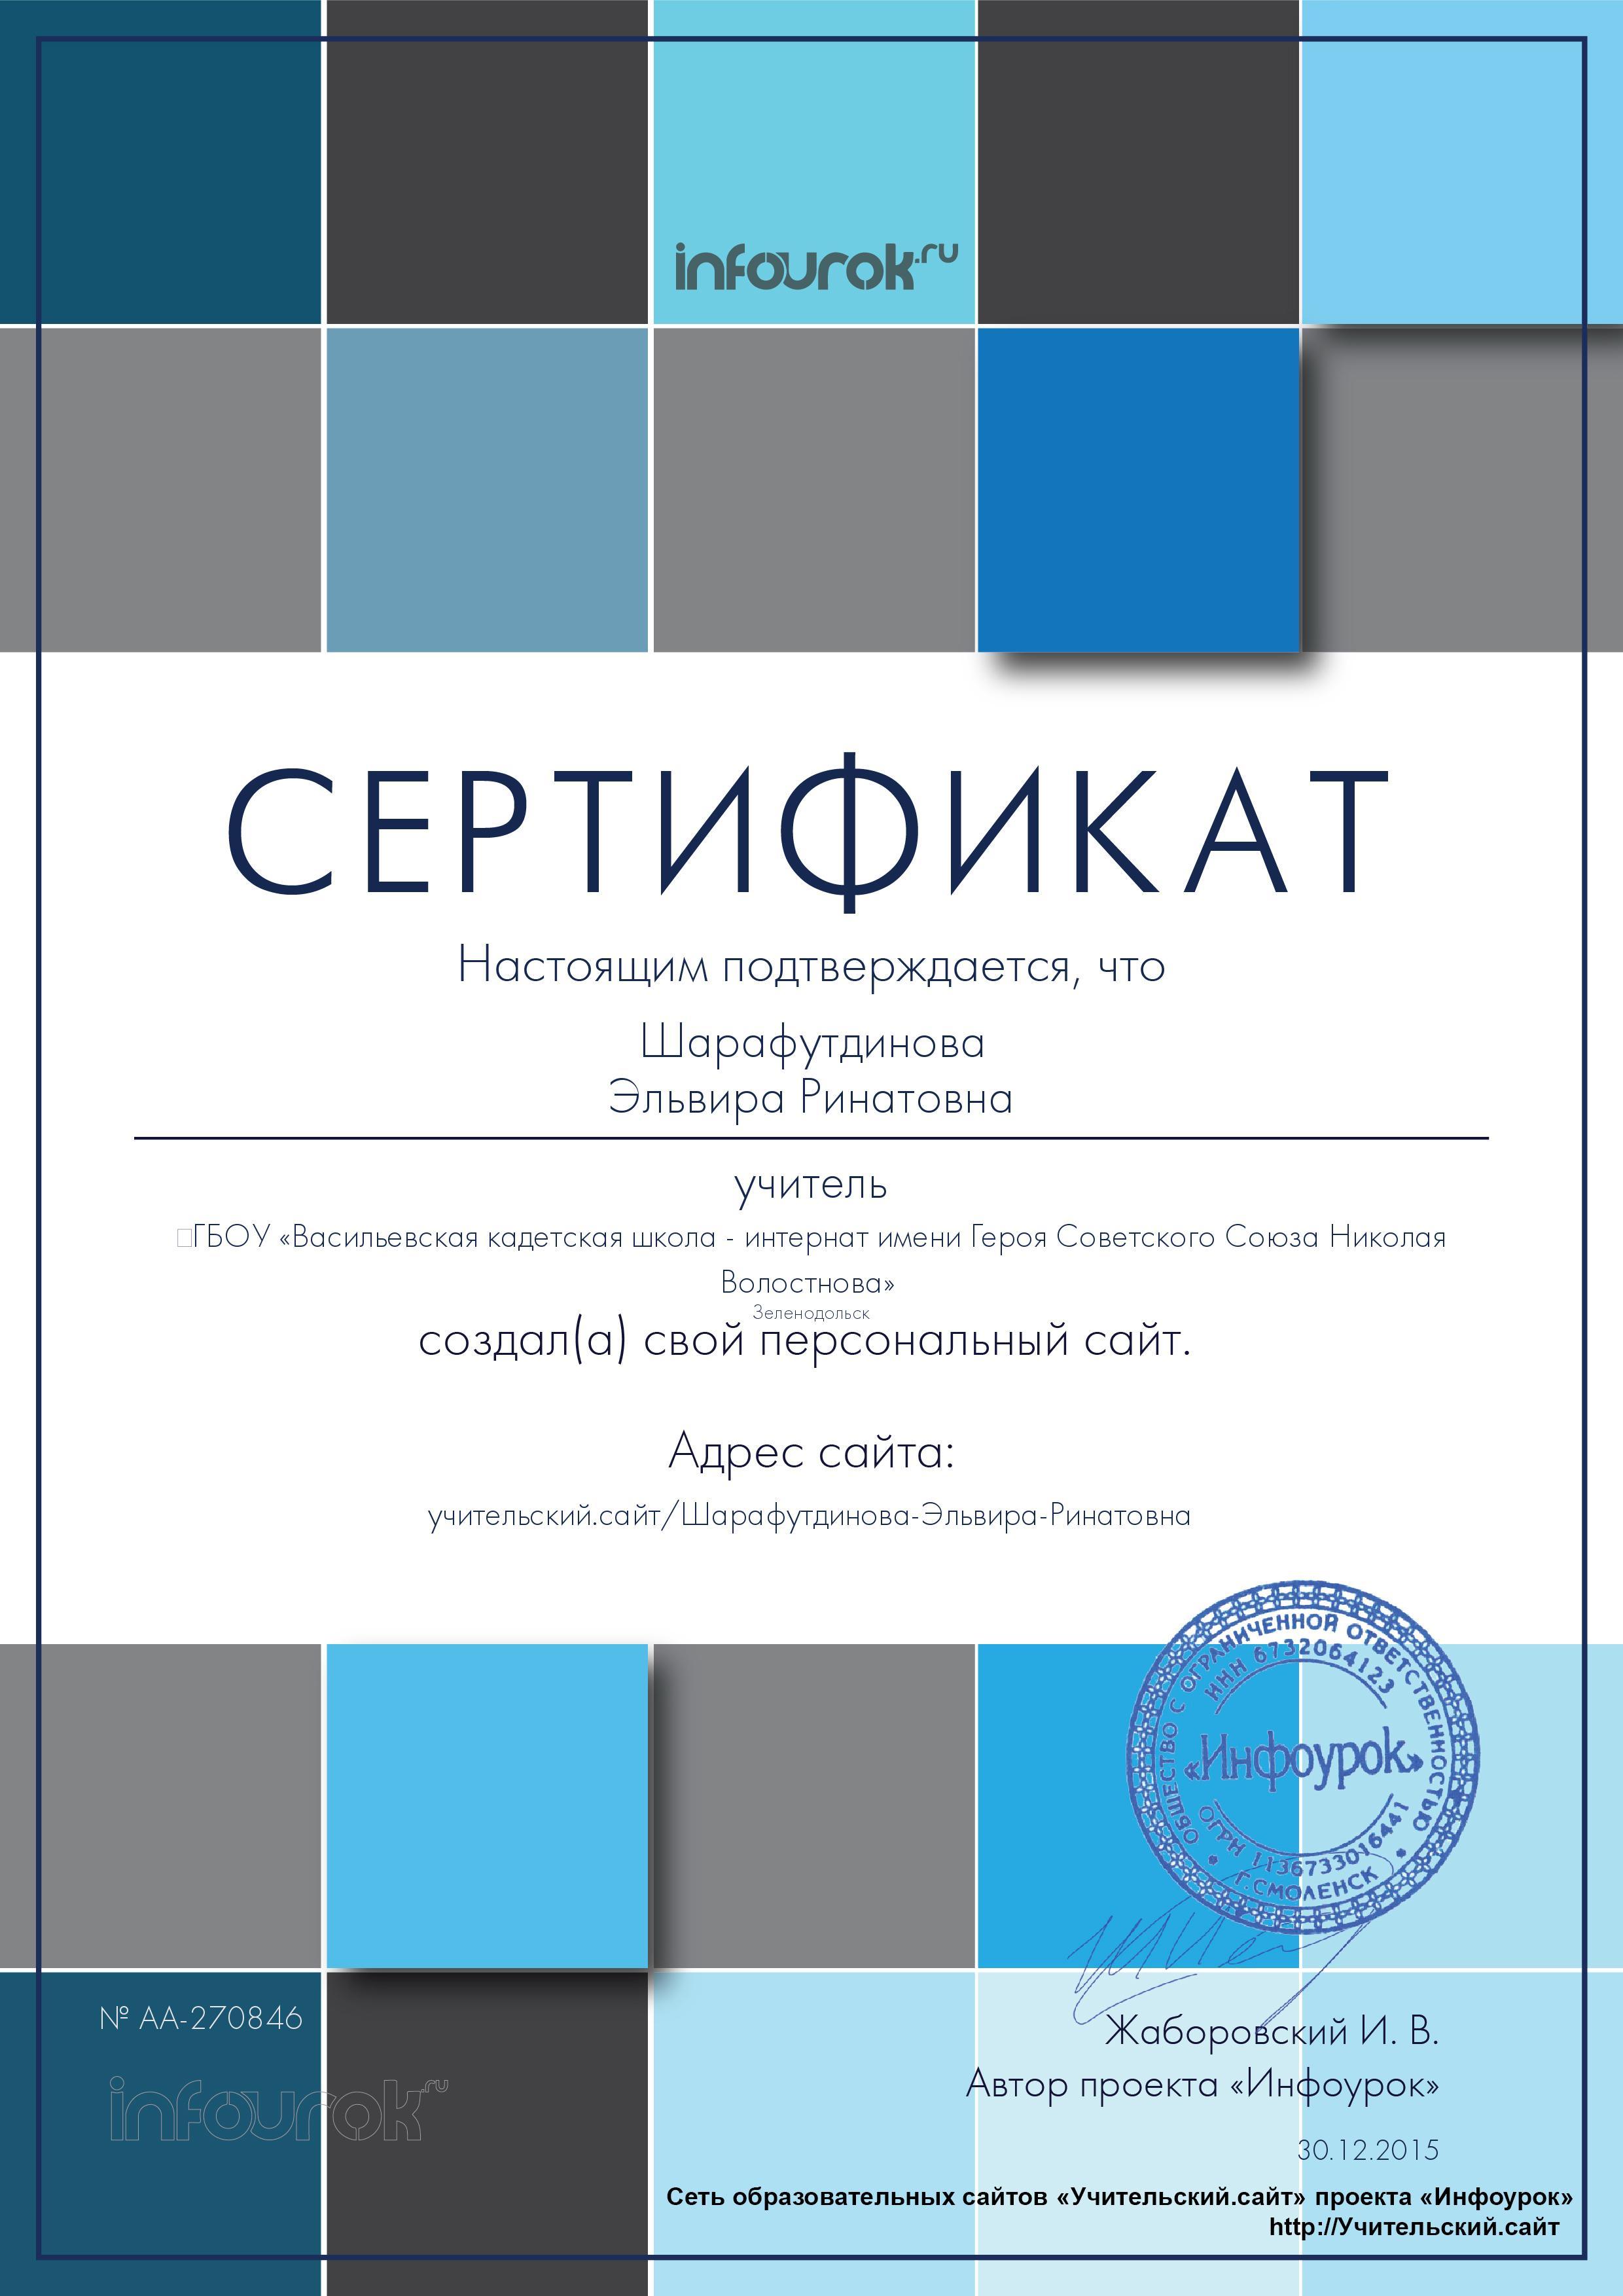 Сертификат проекта infourok.ru № АA-270846 (2).jpg